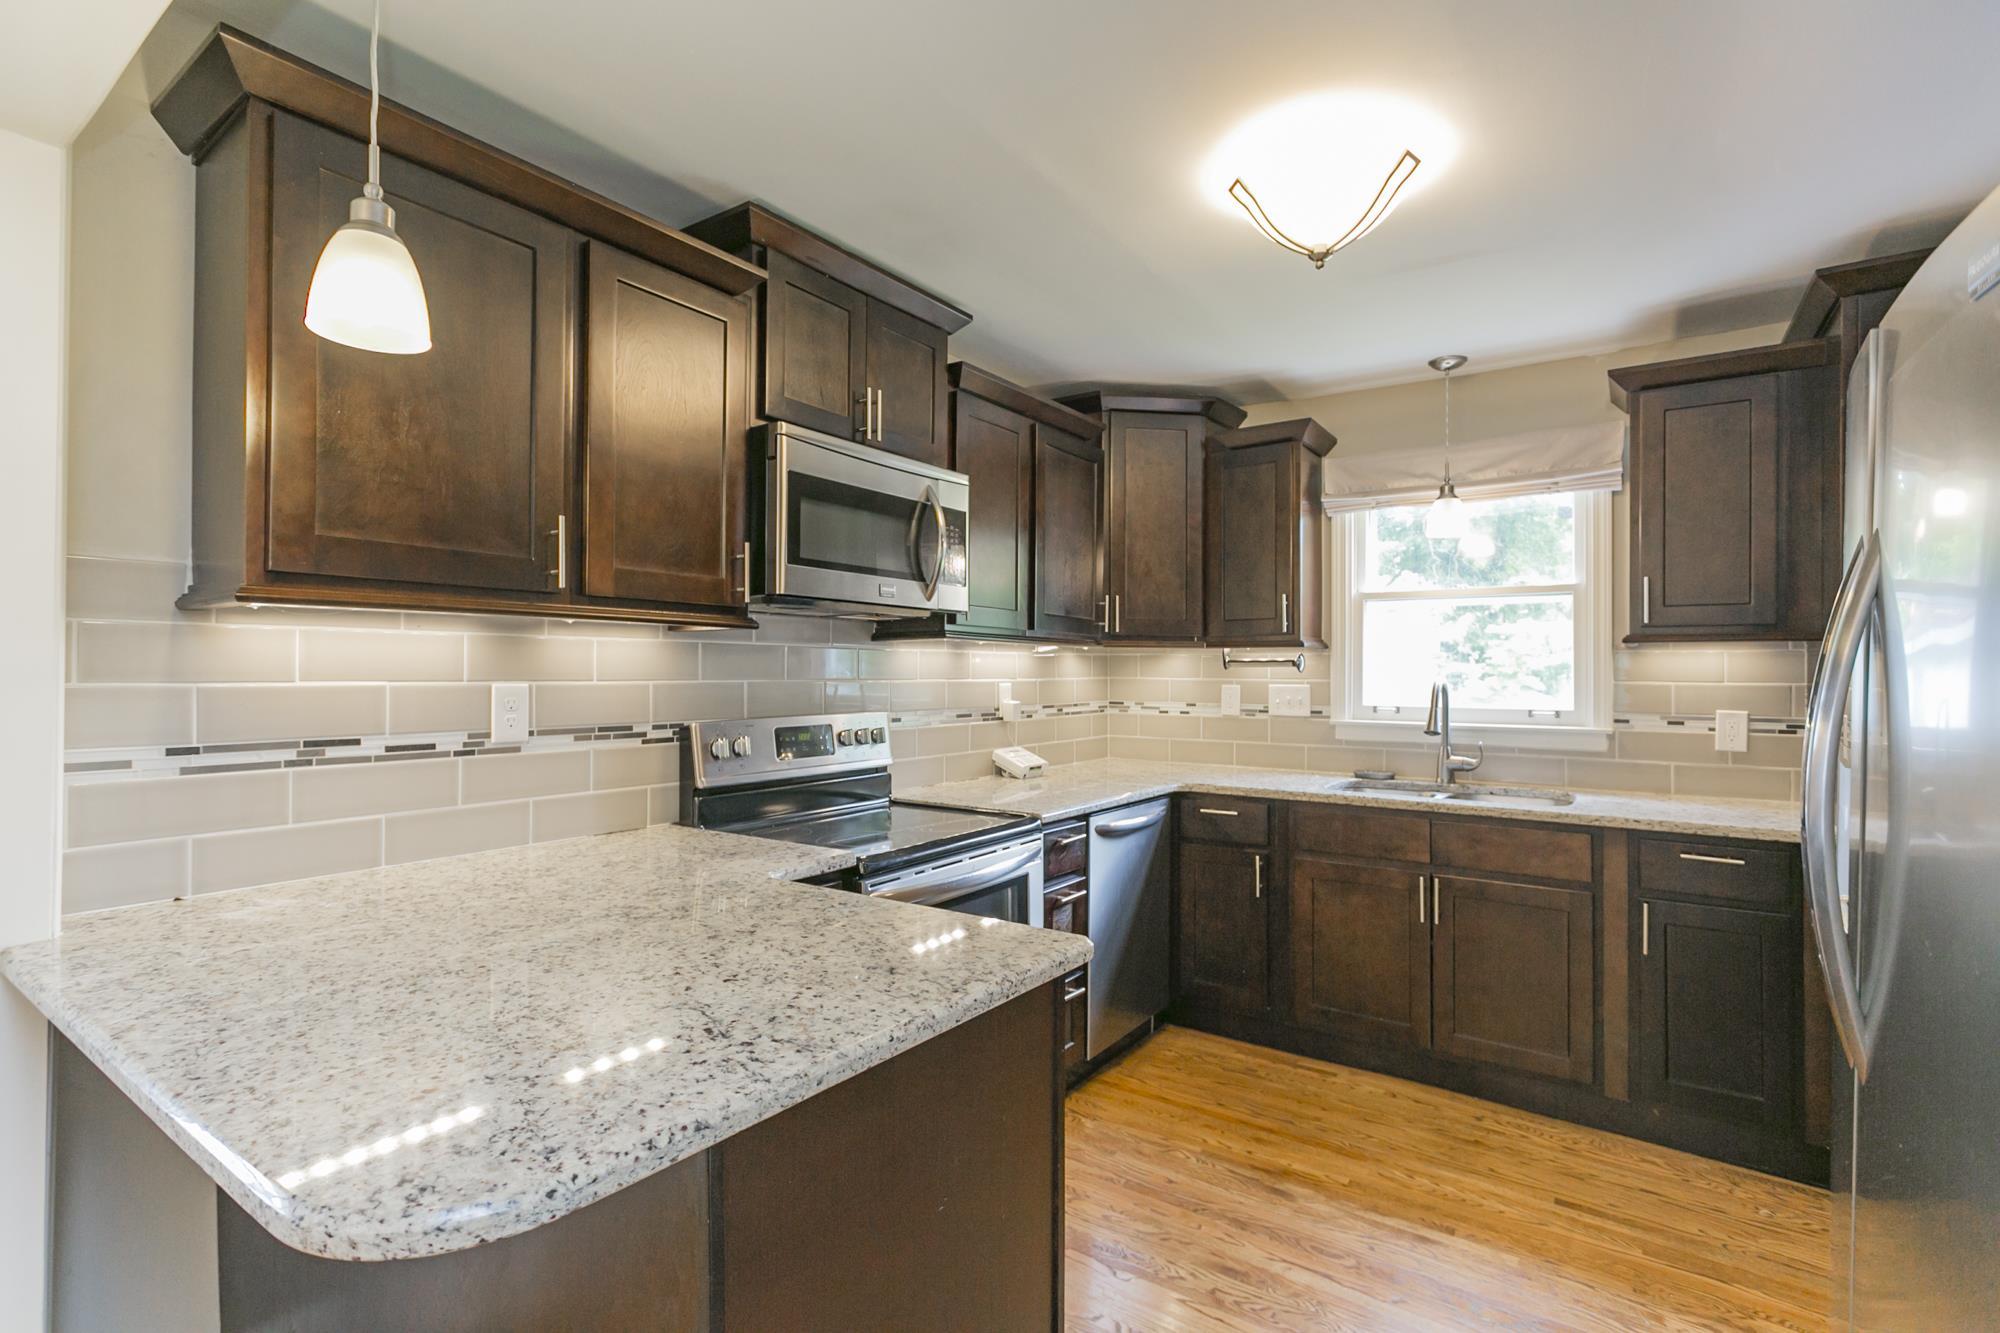 917 Sharpe Ave, Nashville, TN 37206 - Nashville, TN real estate listing